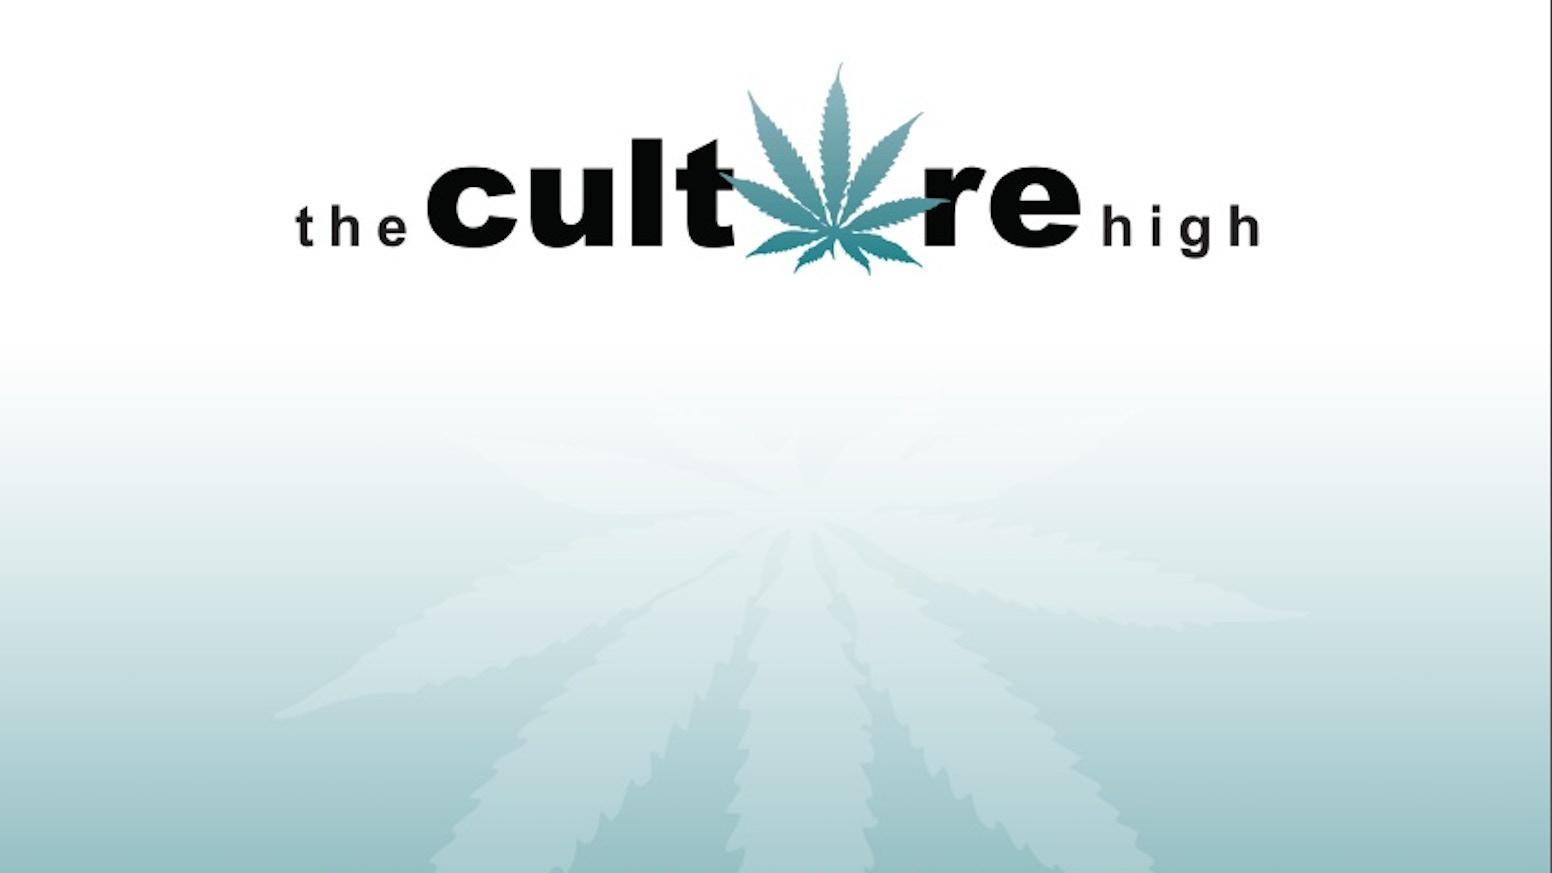 The Culture High by Adam Scorgie » The David Family & Joe Rogan